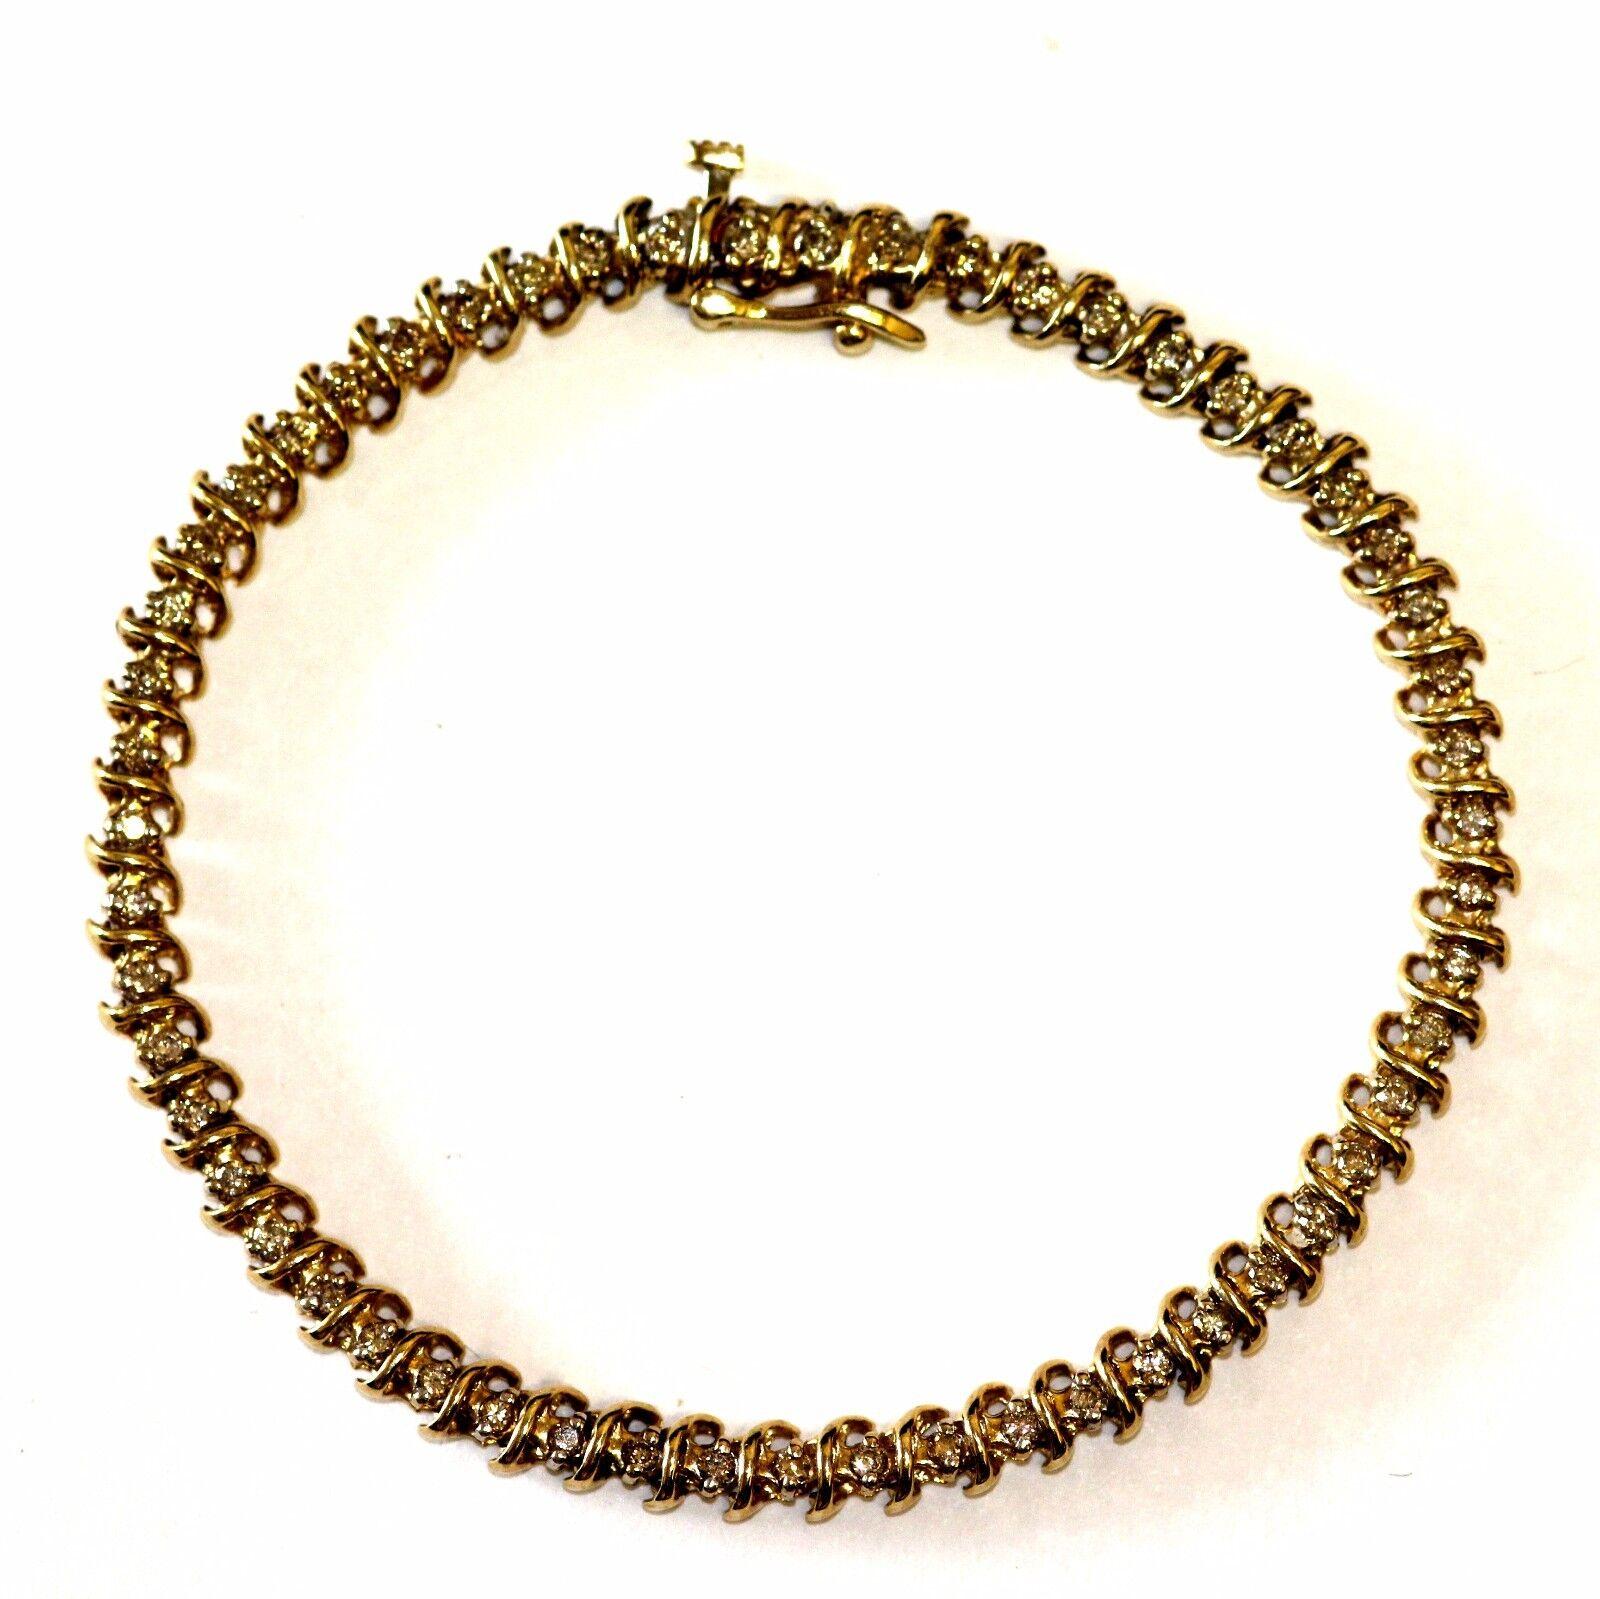 14k yellow gold .82cttw SI2 J diamond tennis bracelet 9.9g vintage estate 7.25